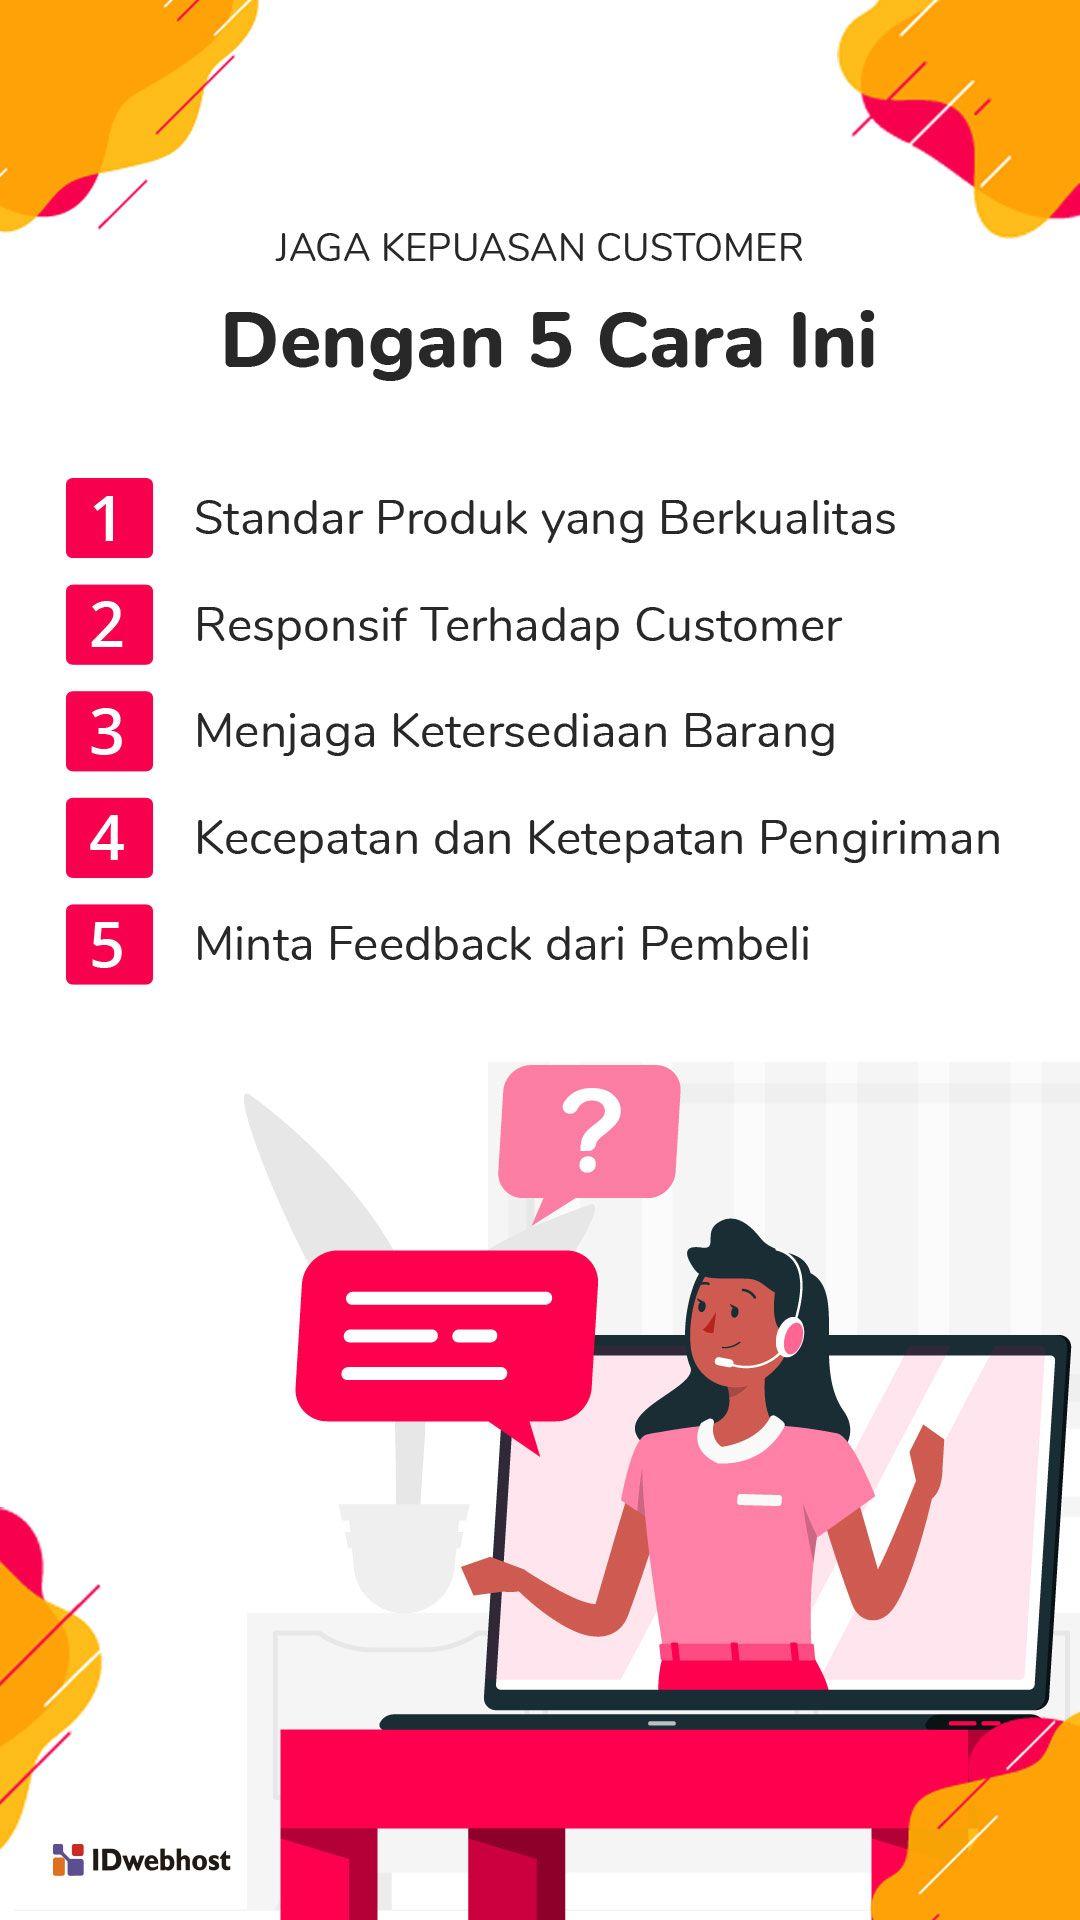 Jaga Kepuasan Customer Produk Pengikut Sahabat